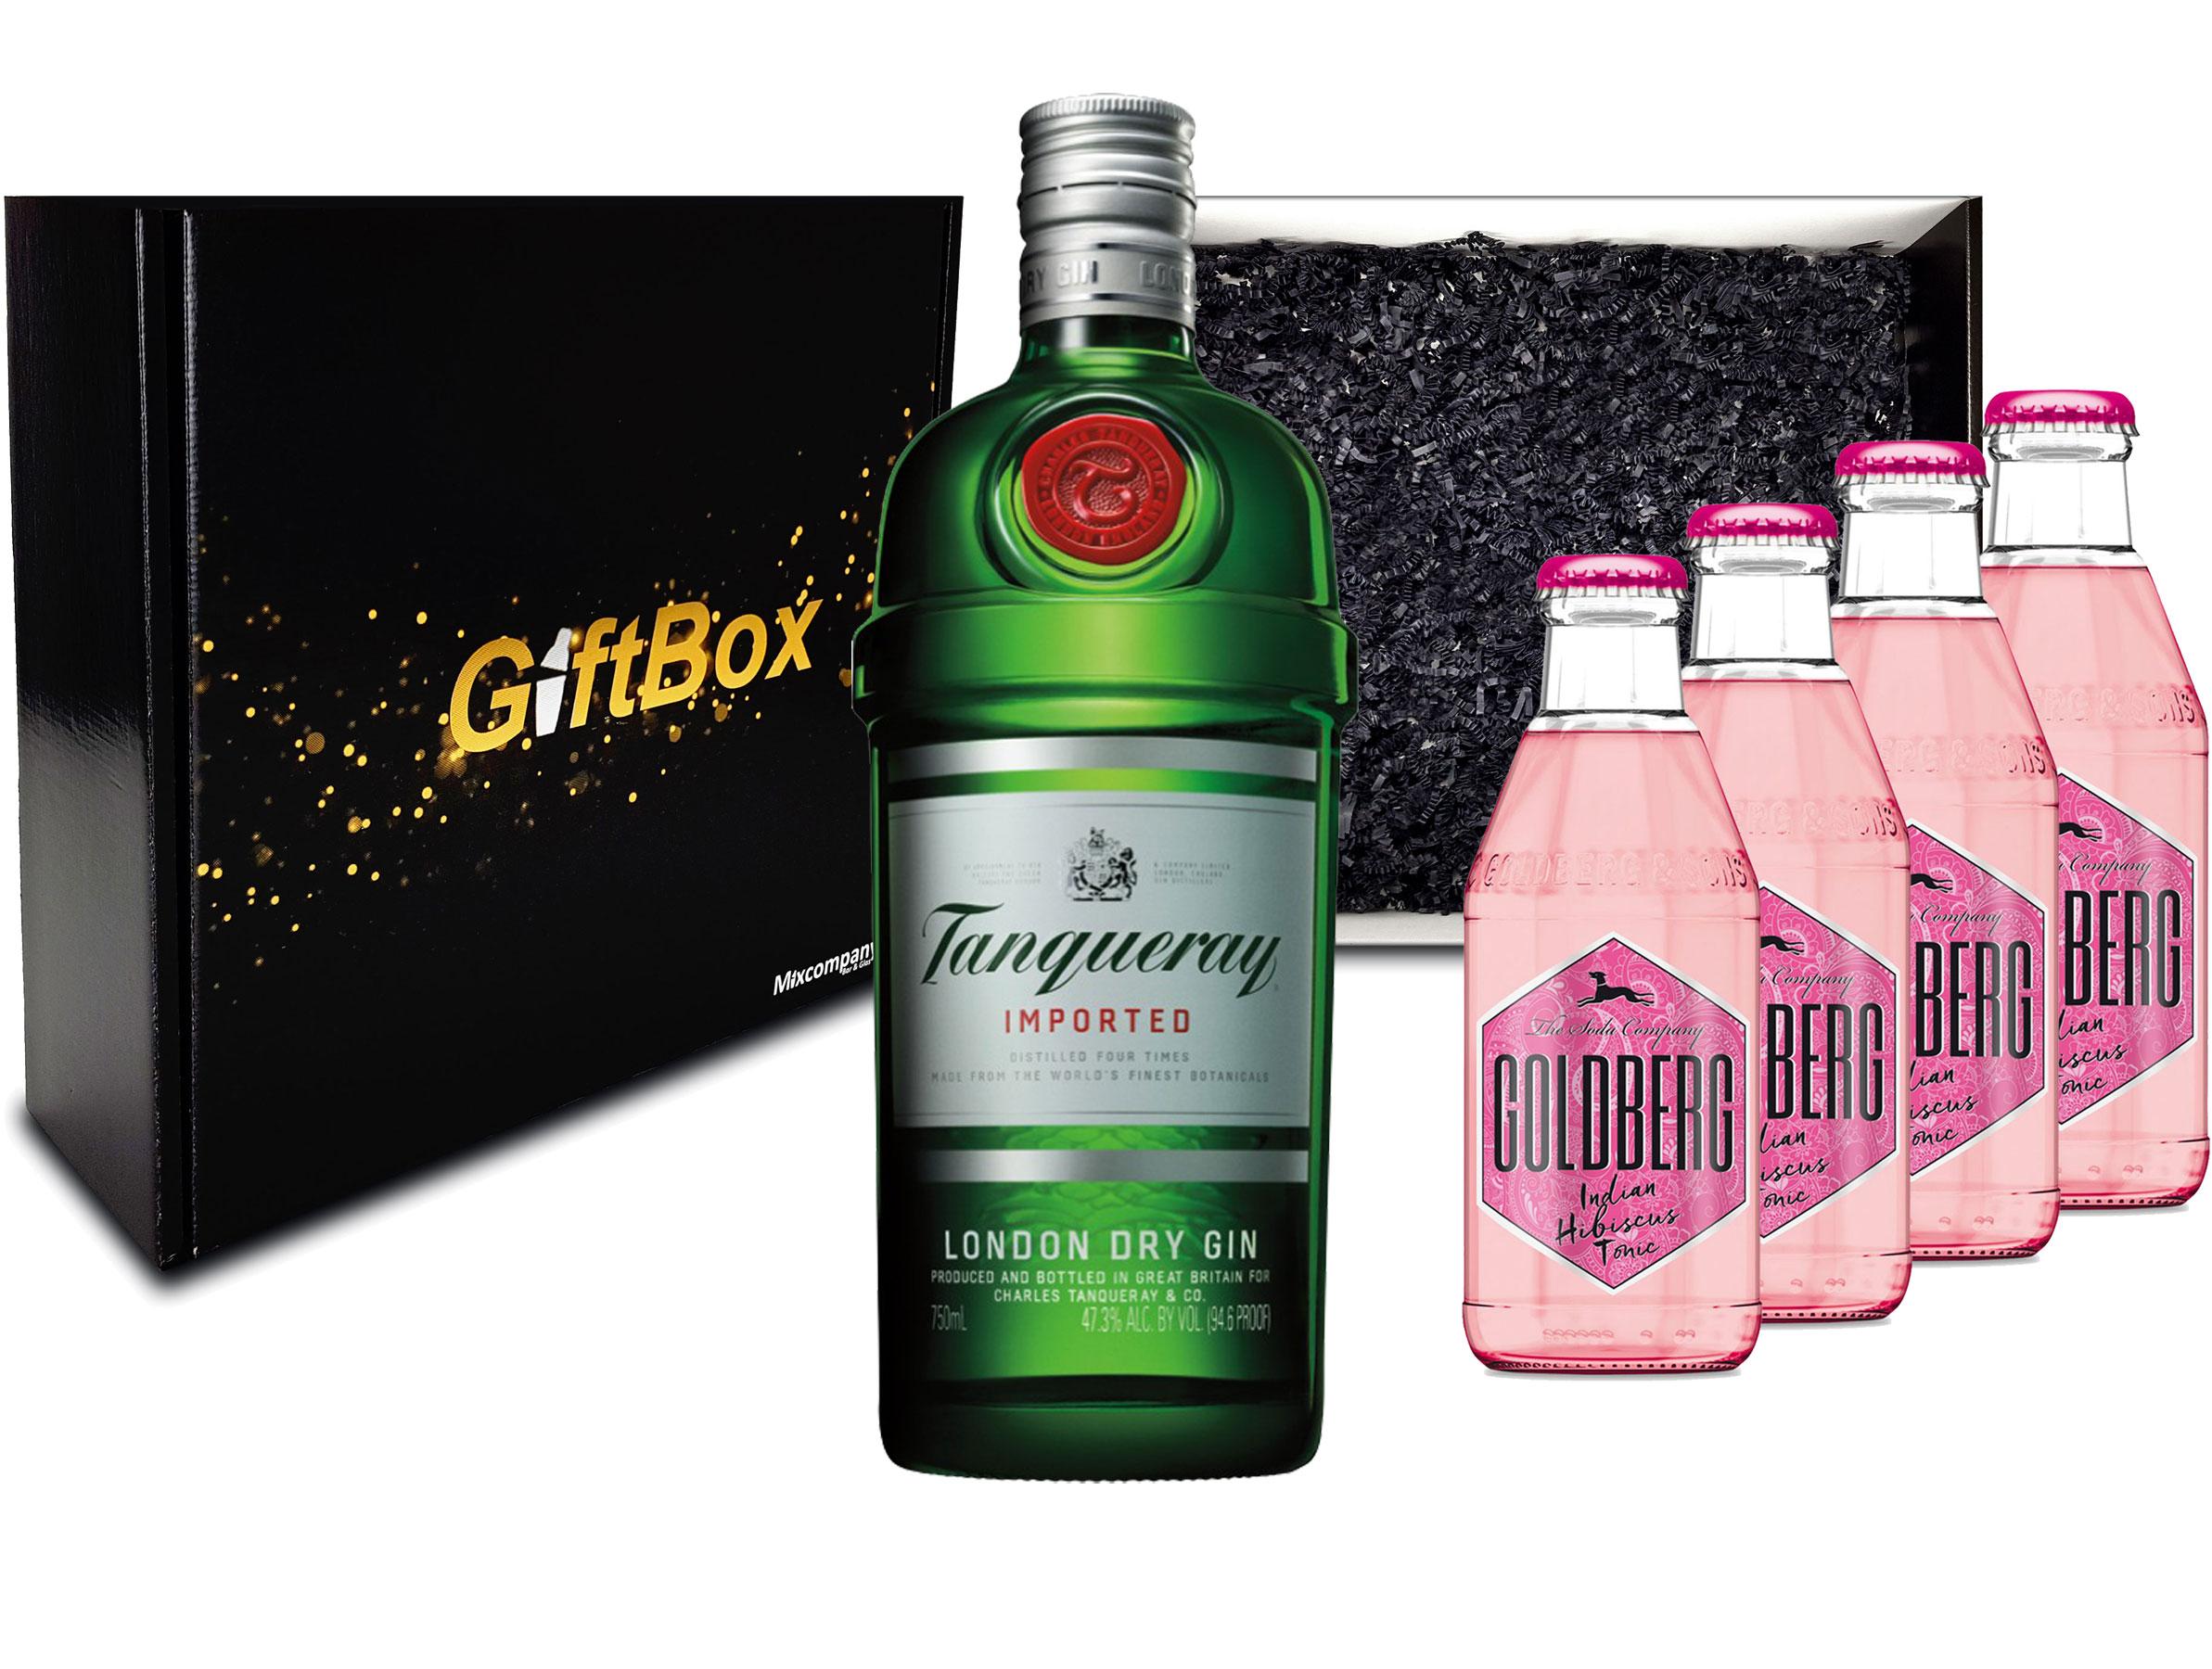 Gin Tonic Set Giftbox Geschenkset - Tanqueray London Dry Gin 0,7l 700ml (47,3% Vol) + 4x Goldberg Indian Hibiscus Tonic 200ml inkl. Pfand MEHRWEG -[Enthält Sulfite]